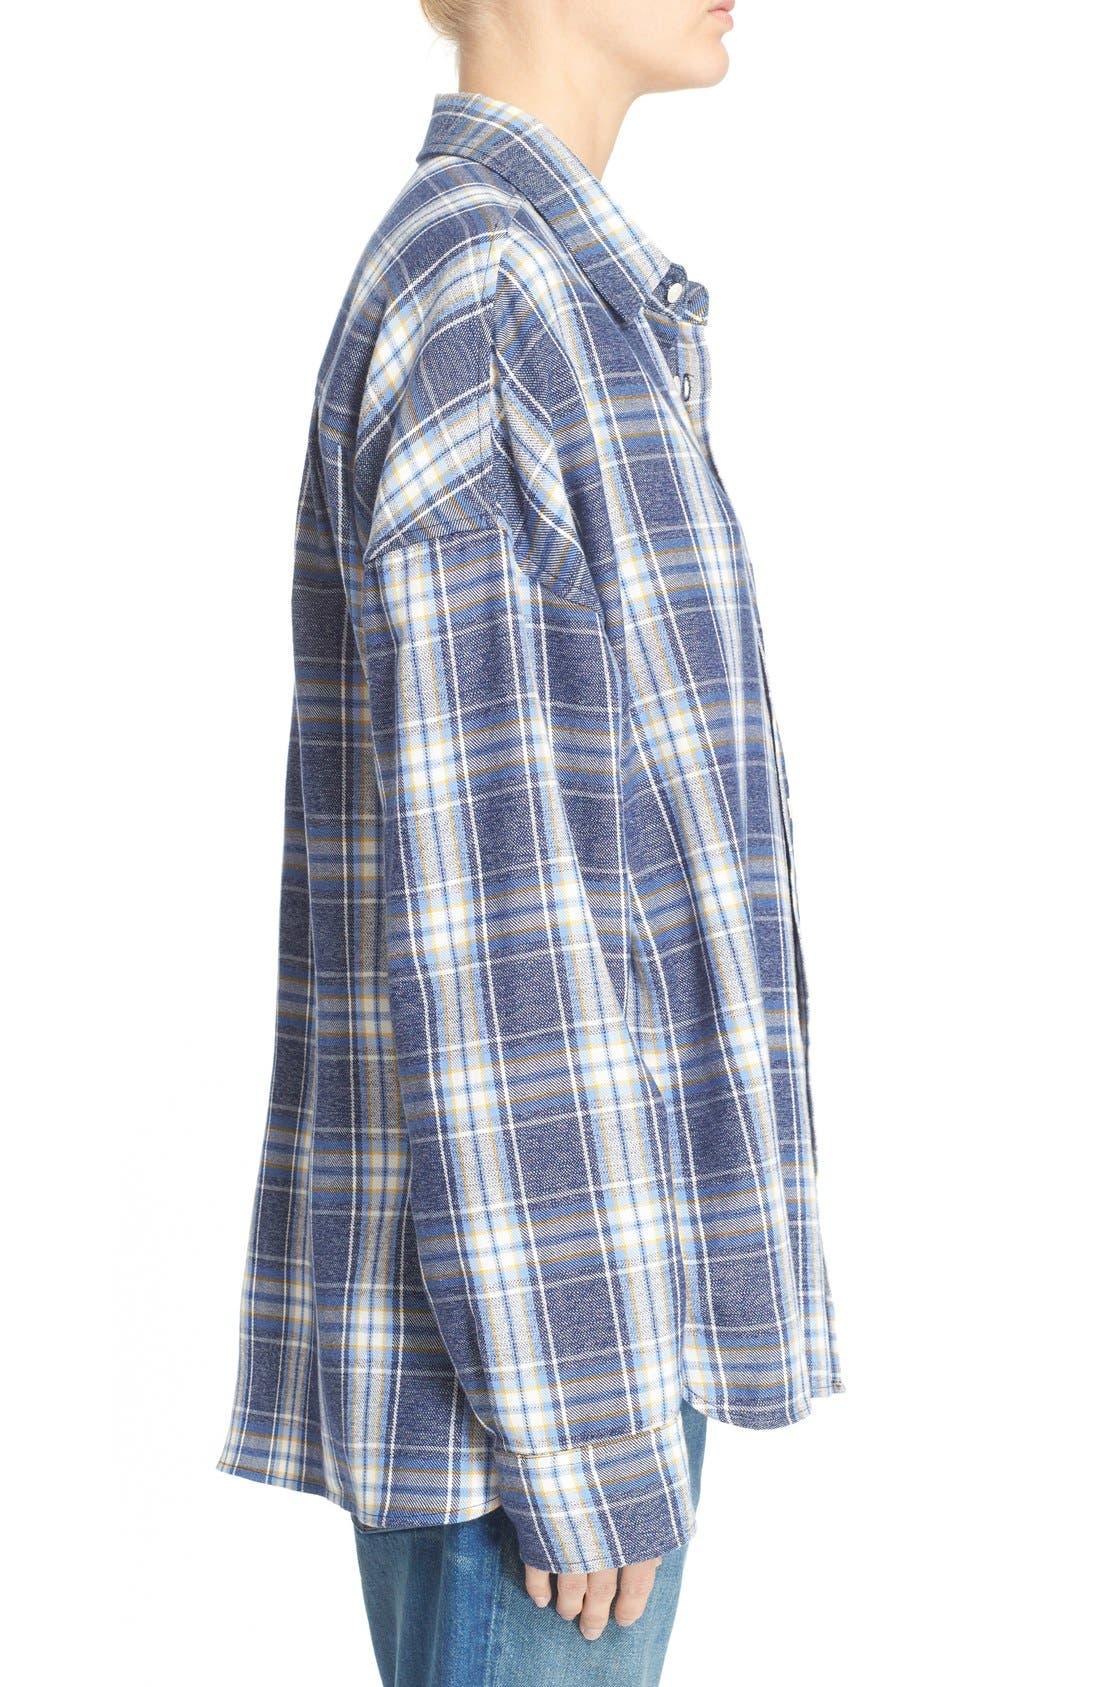 Alternate Image 3  - 6397 'Lori' Cotton Flannel Shirt